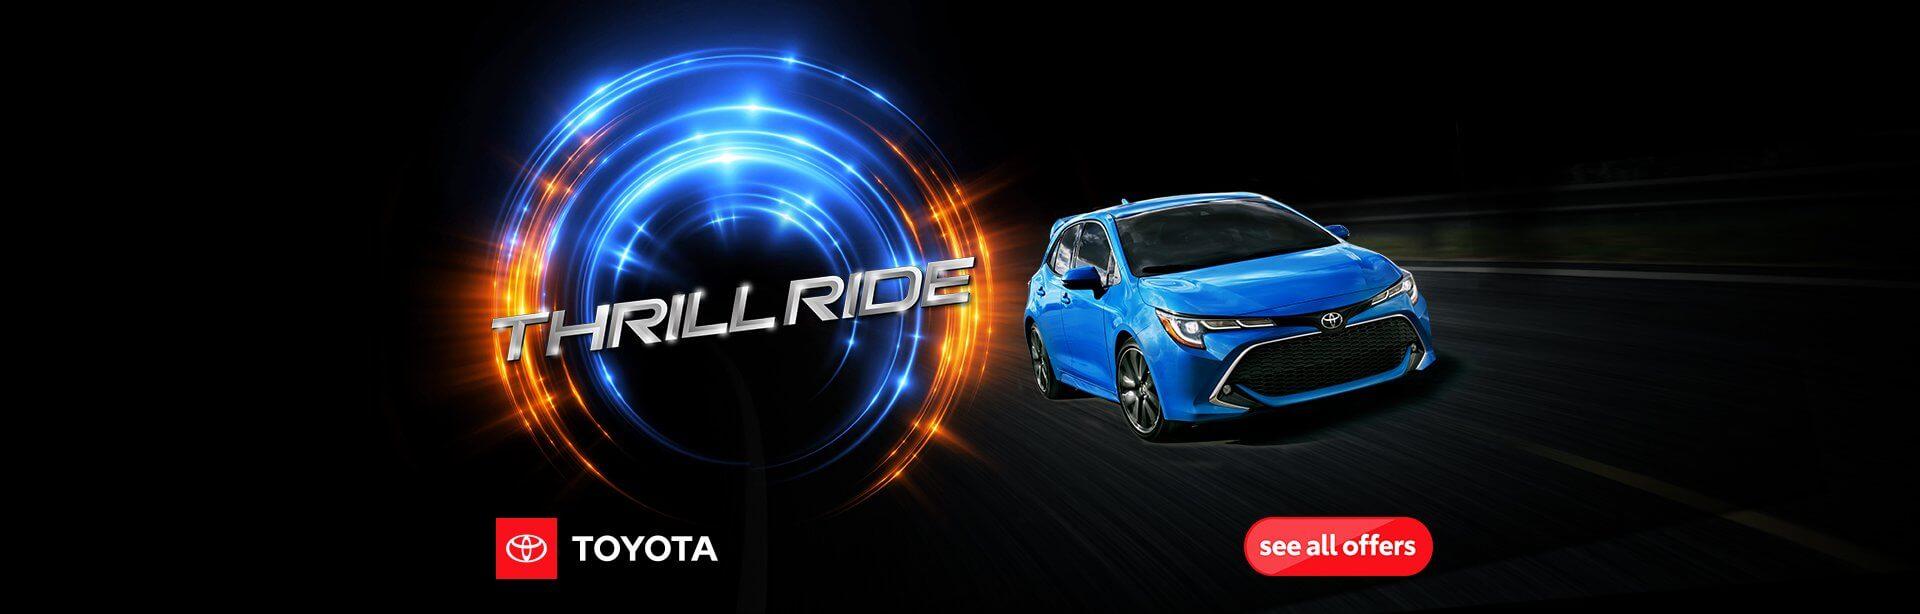 Thrill Ride Sales Event